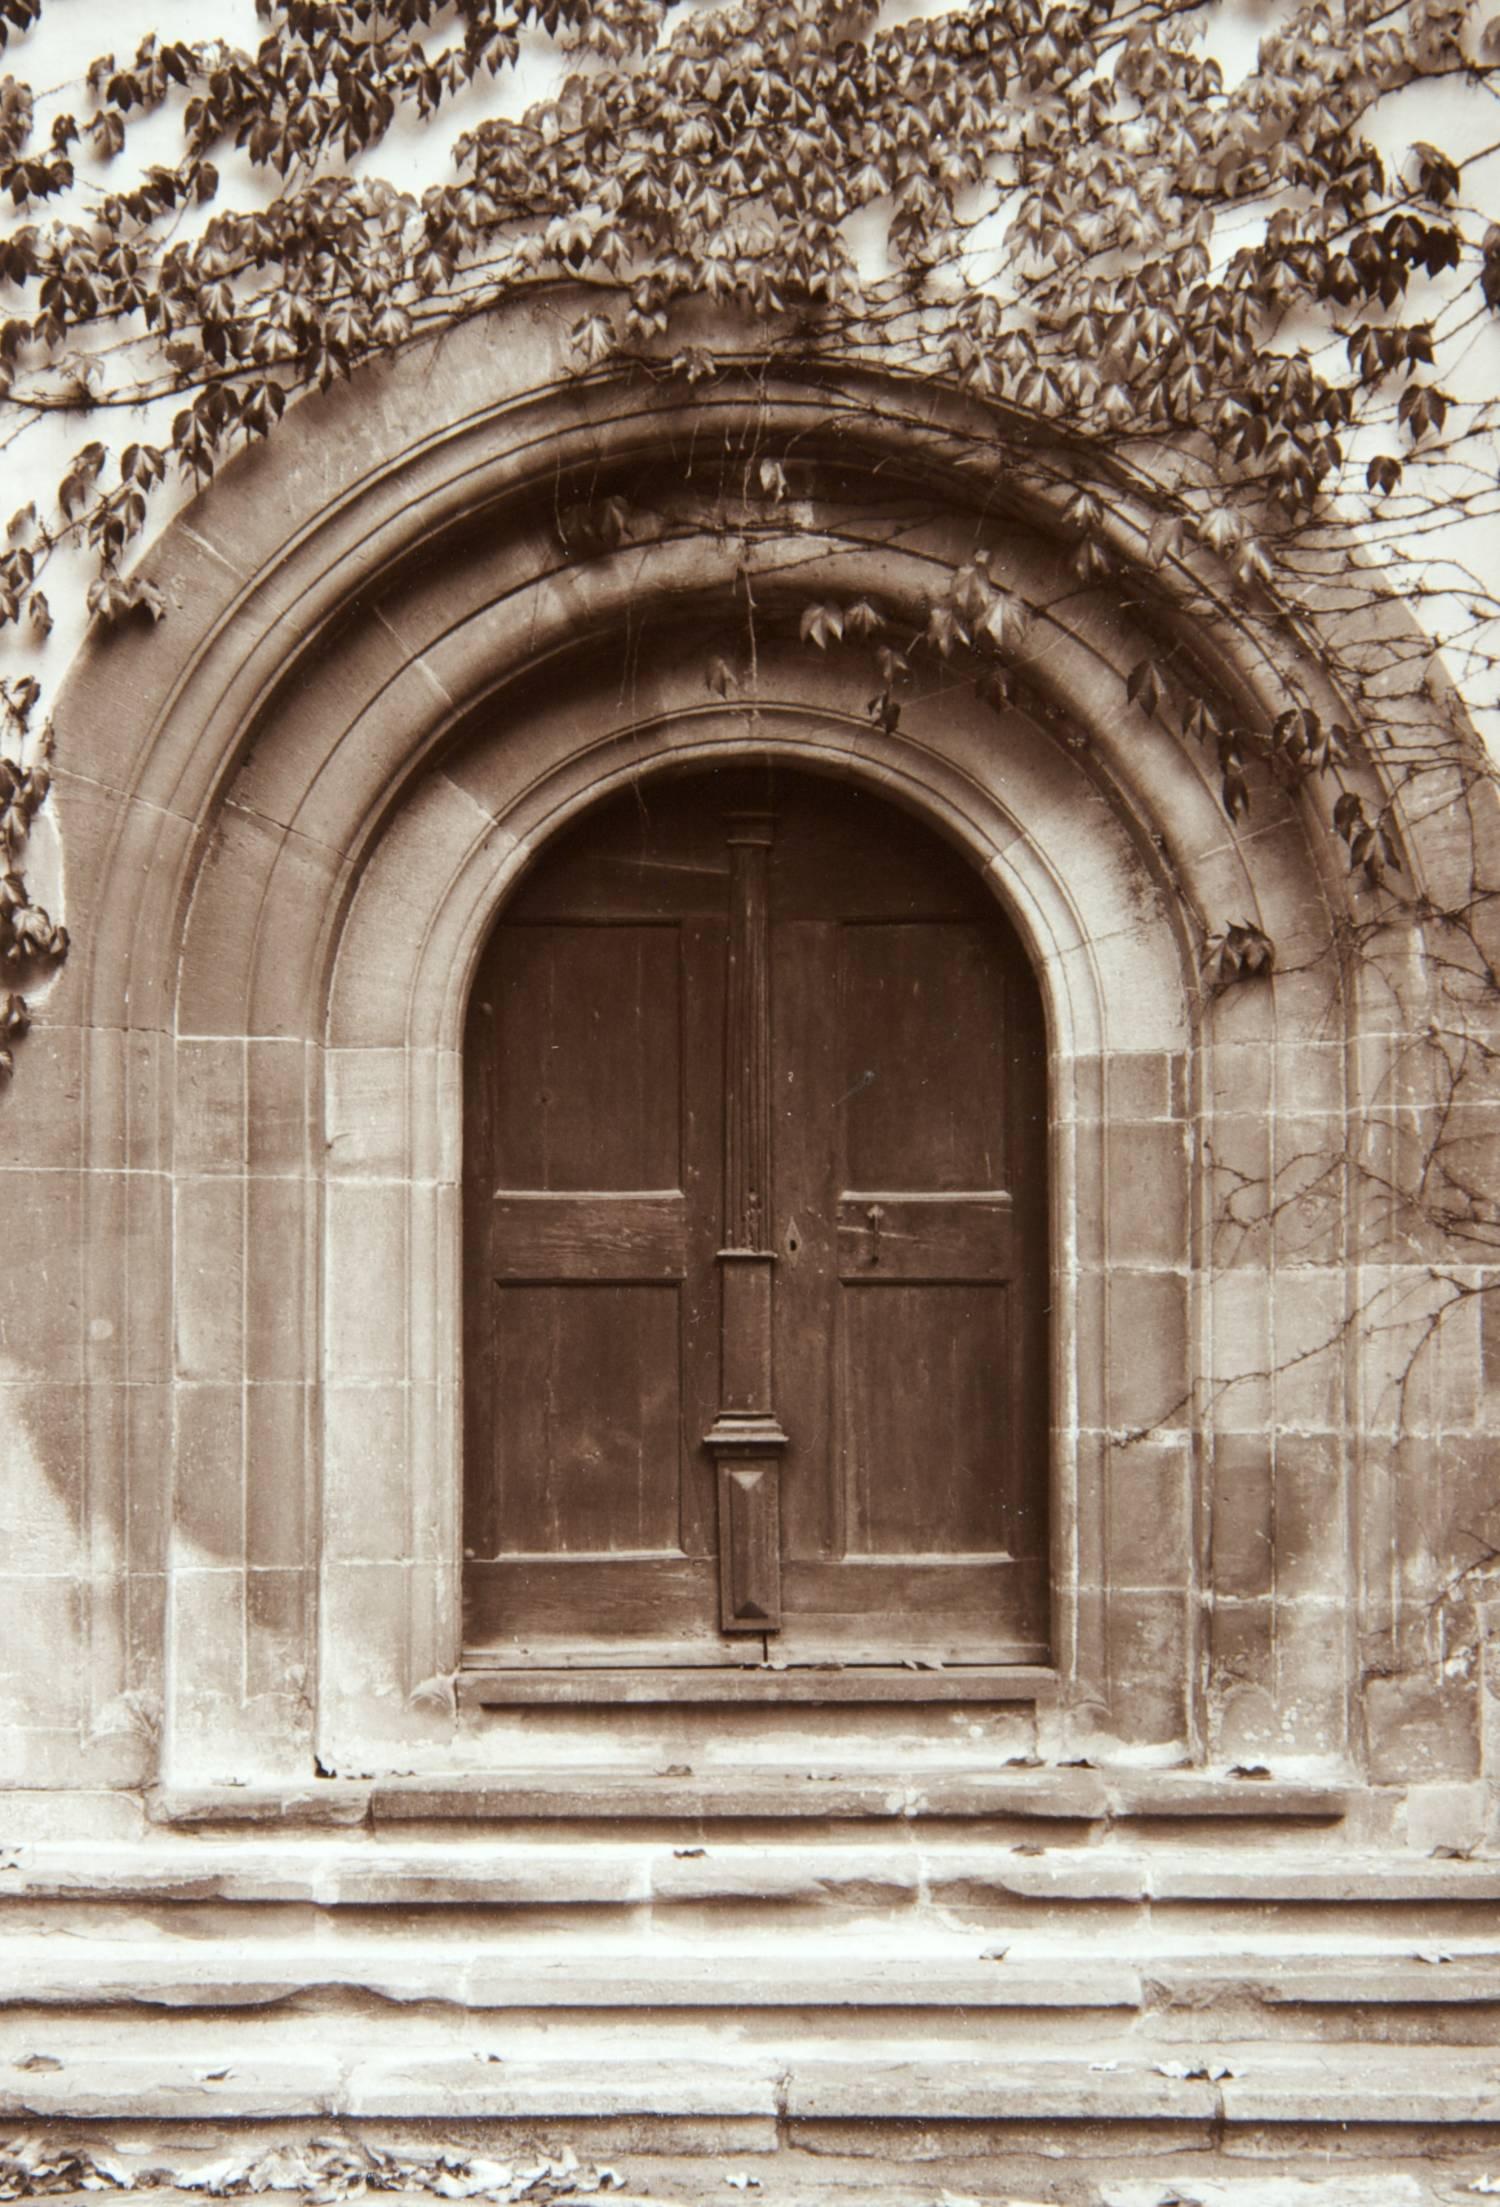 Doors & Ivy (Bronnbach, Germany)